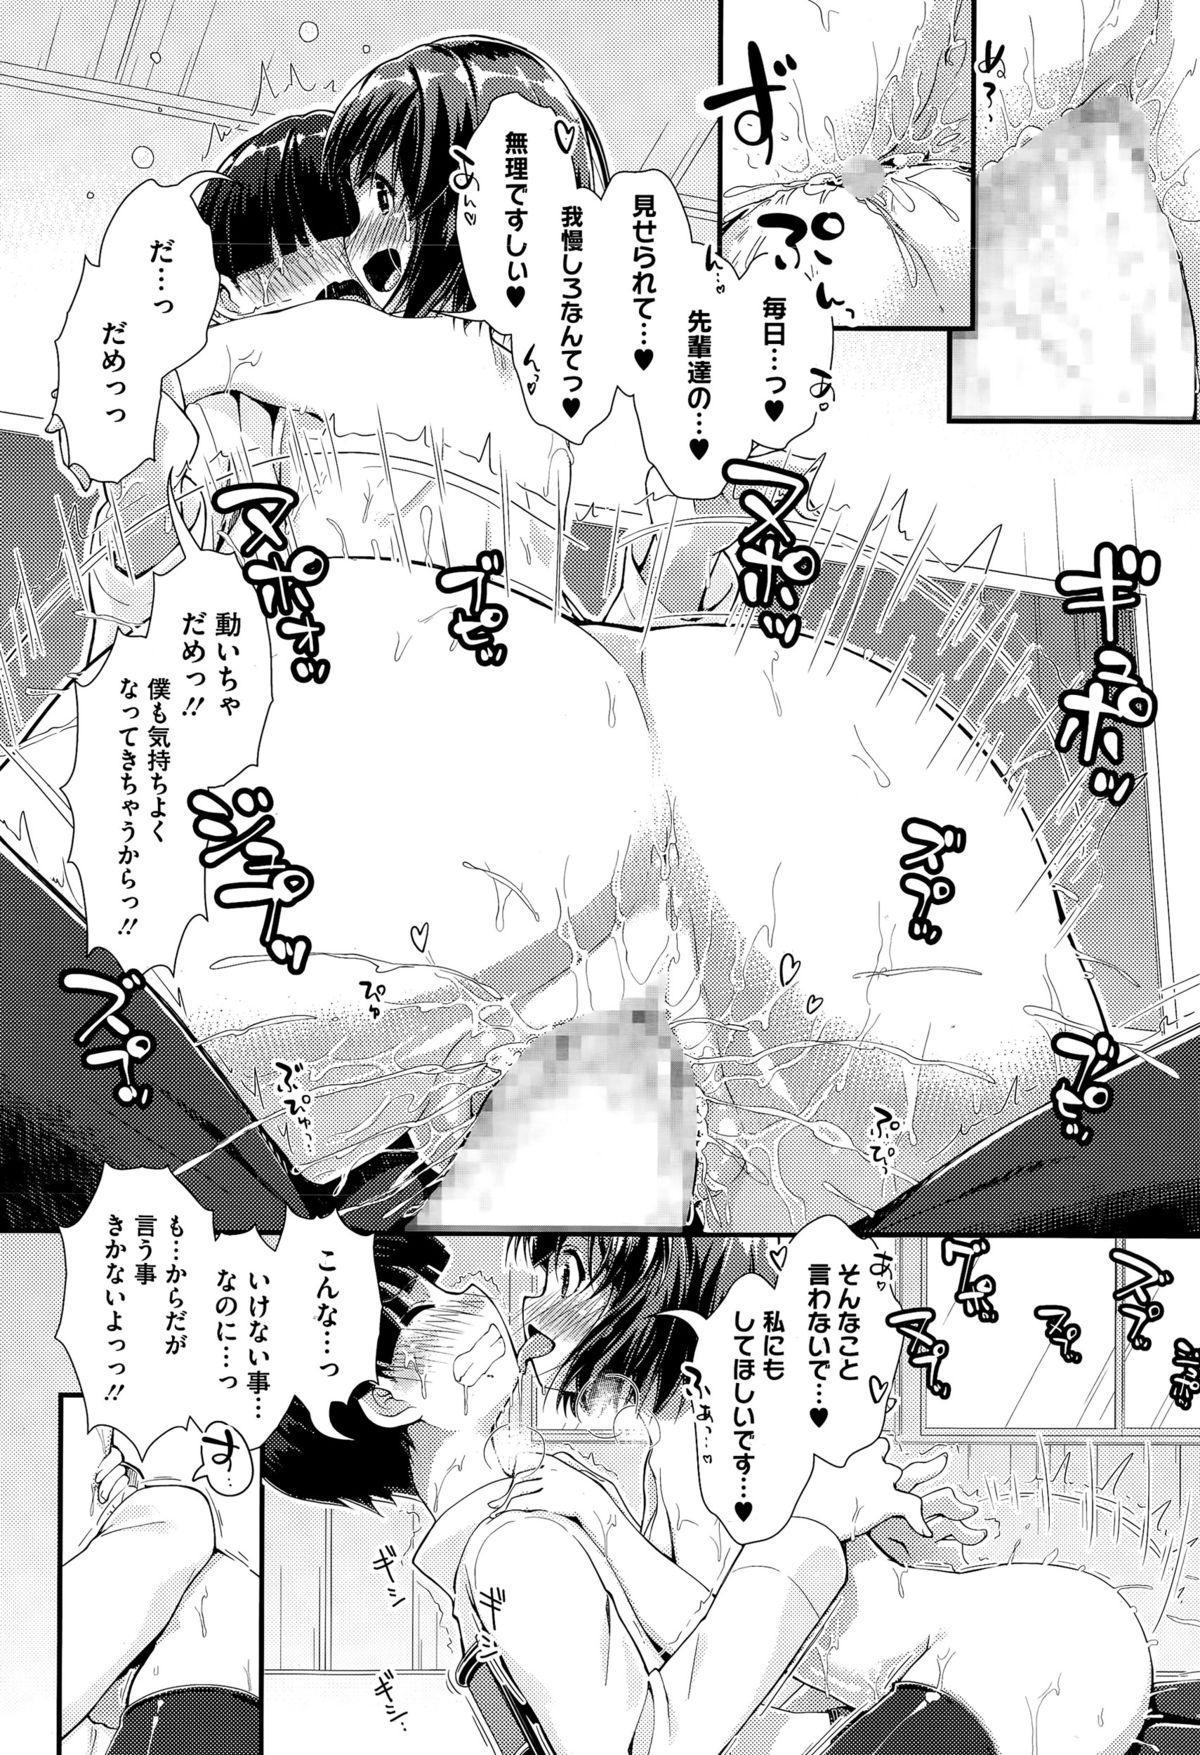 nariyukimakase no obbligato 36